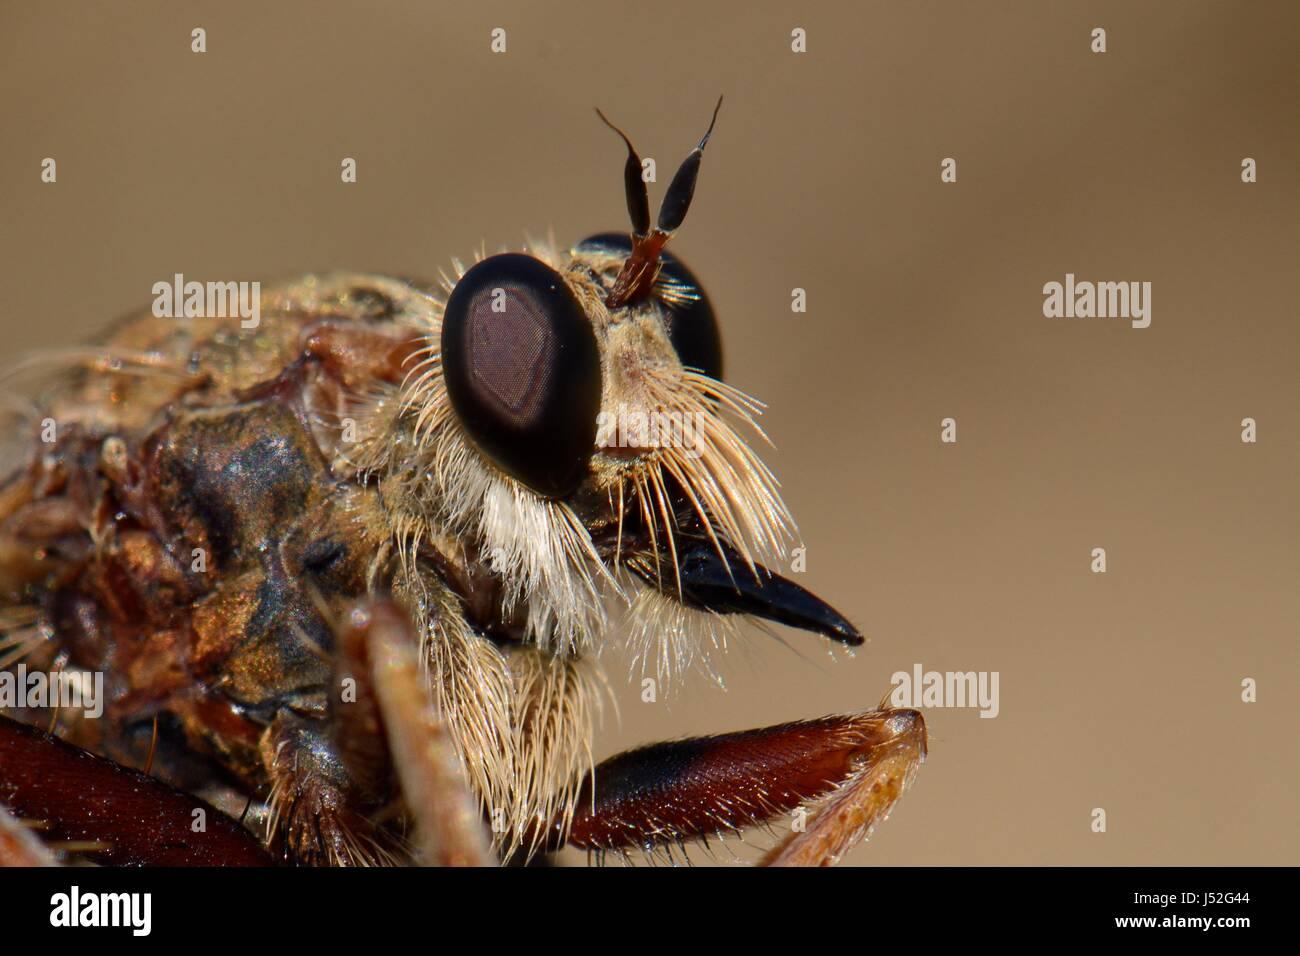 Close up of a Hornet robberfly (Asilus crabroniformis) head as it scans for prey, Picos de Europa mountains, Asturias, - Stock Image